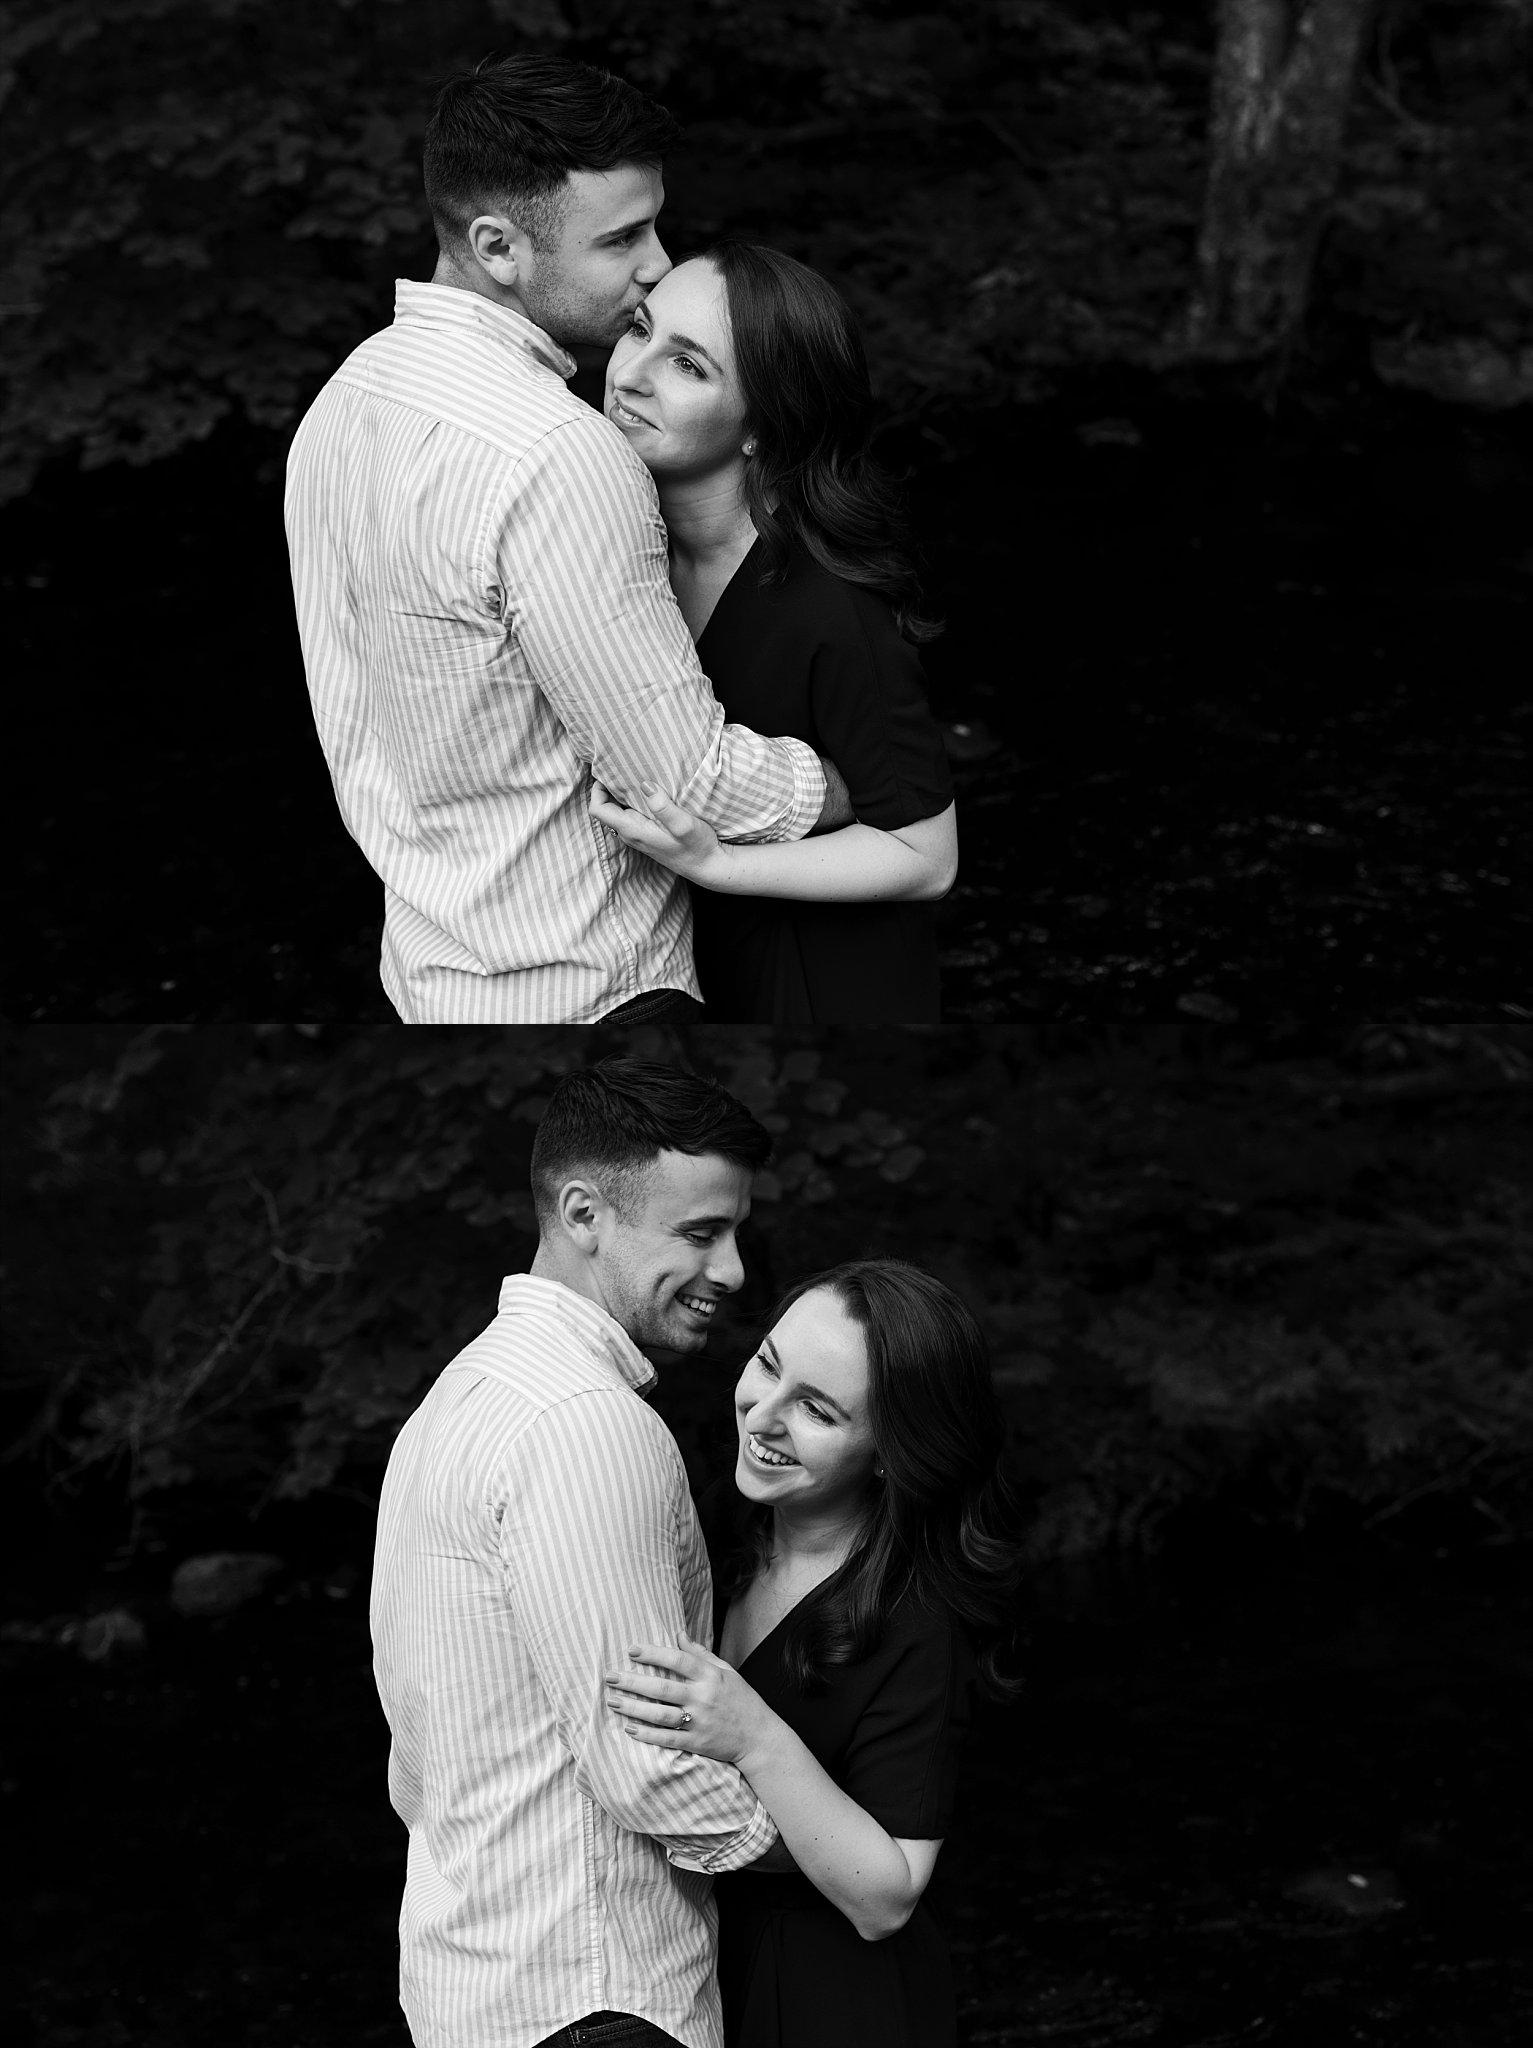 connecticut elopment photography